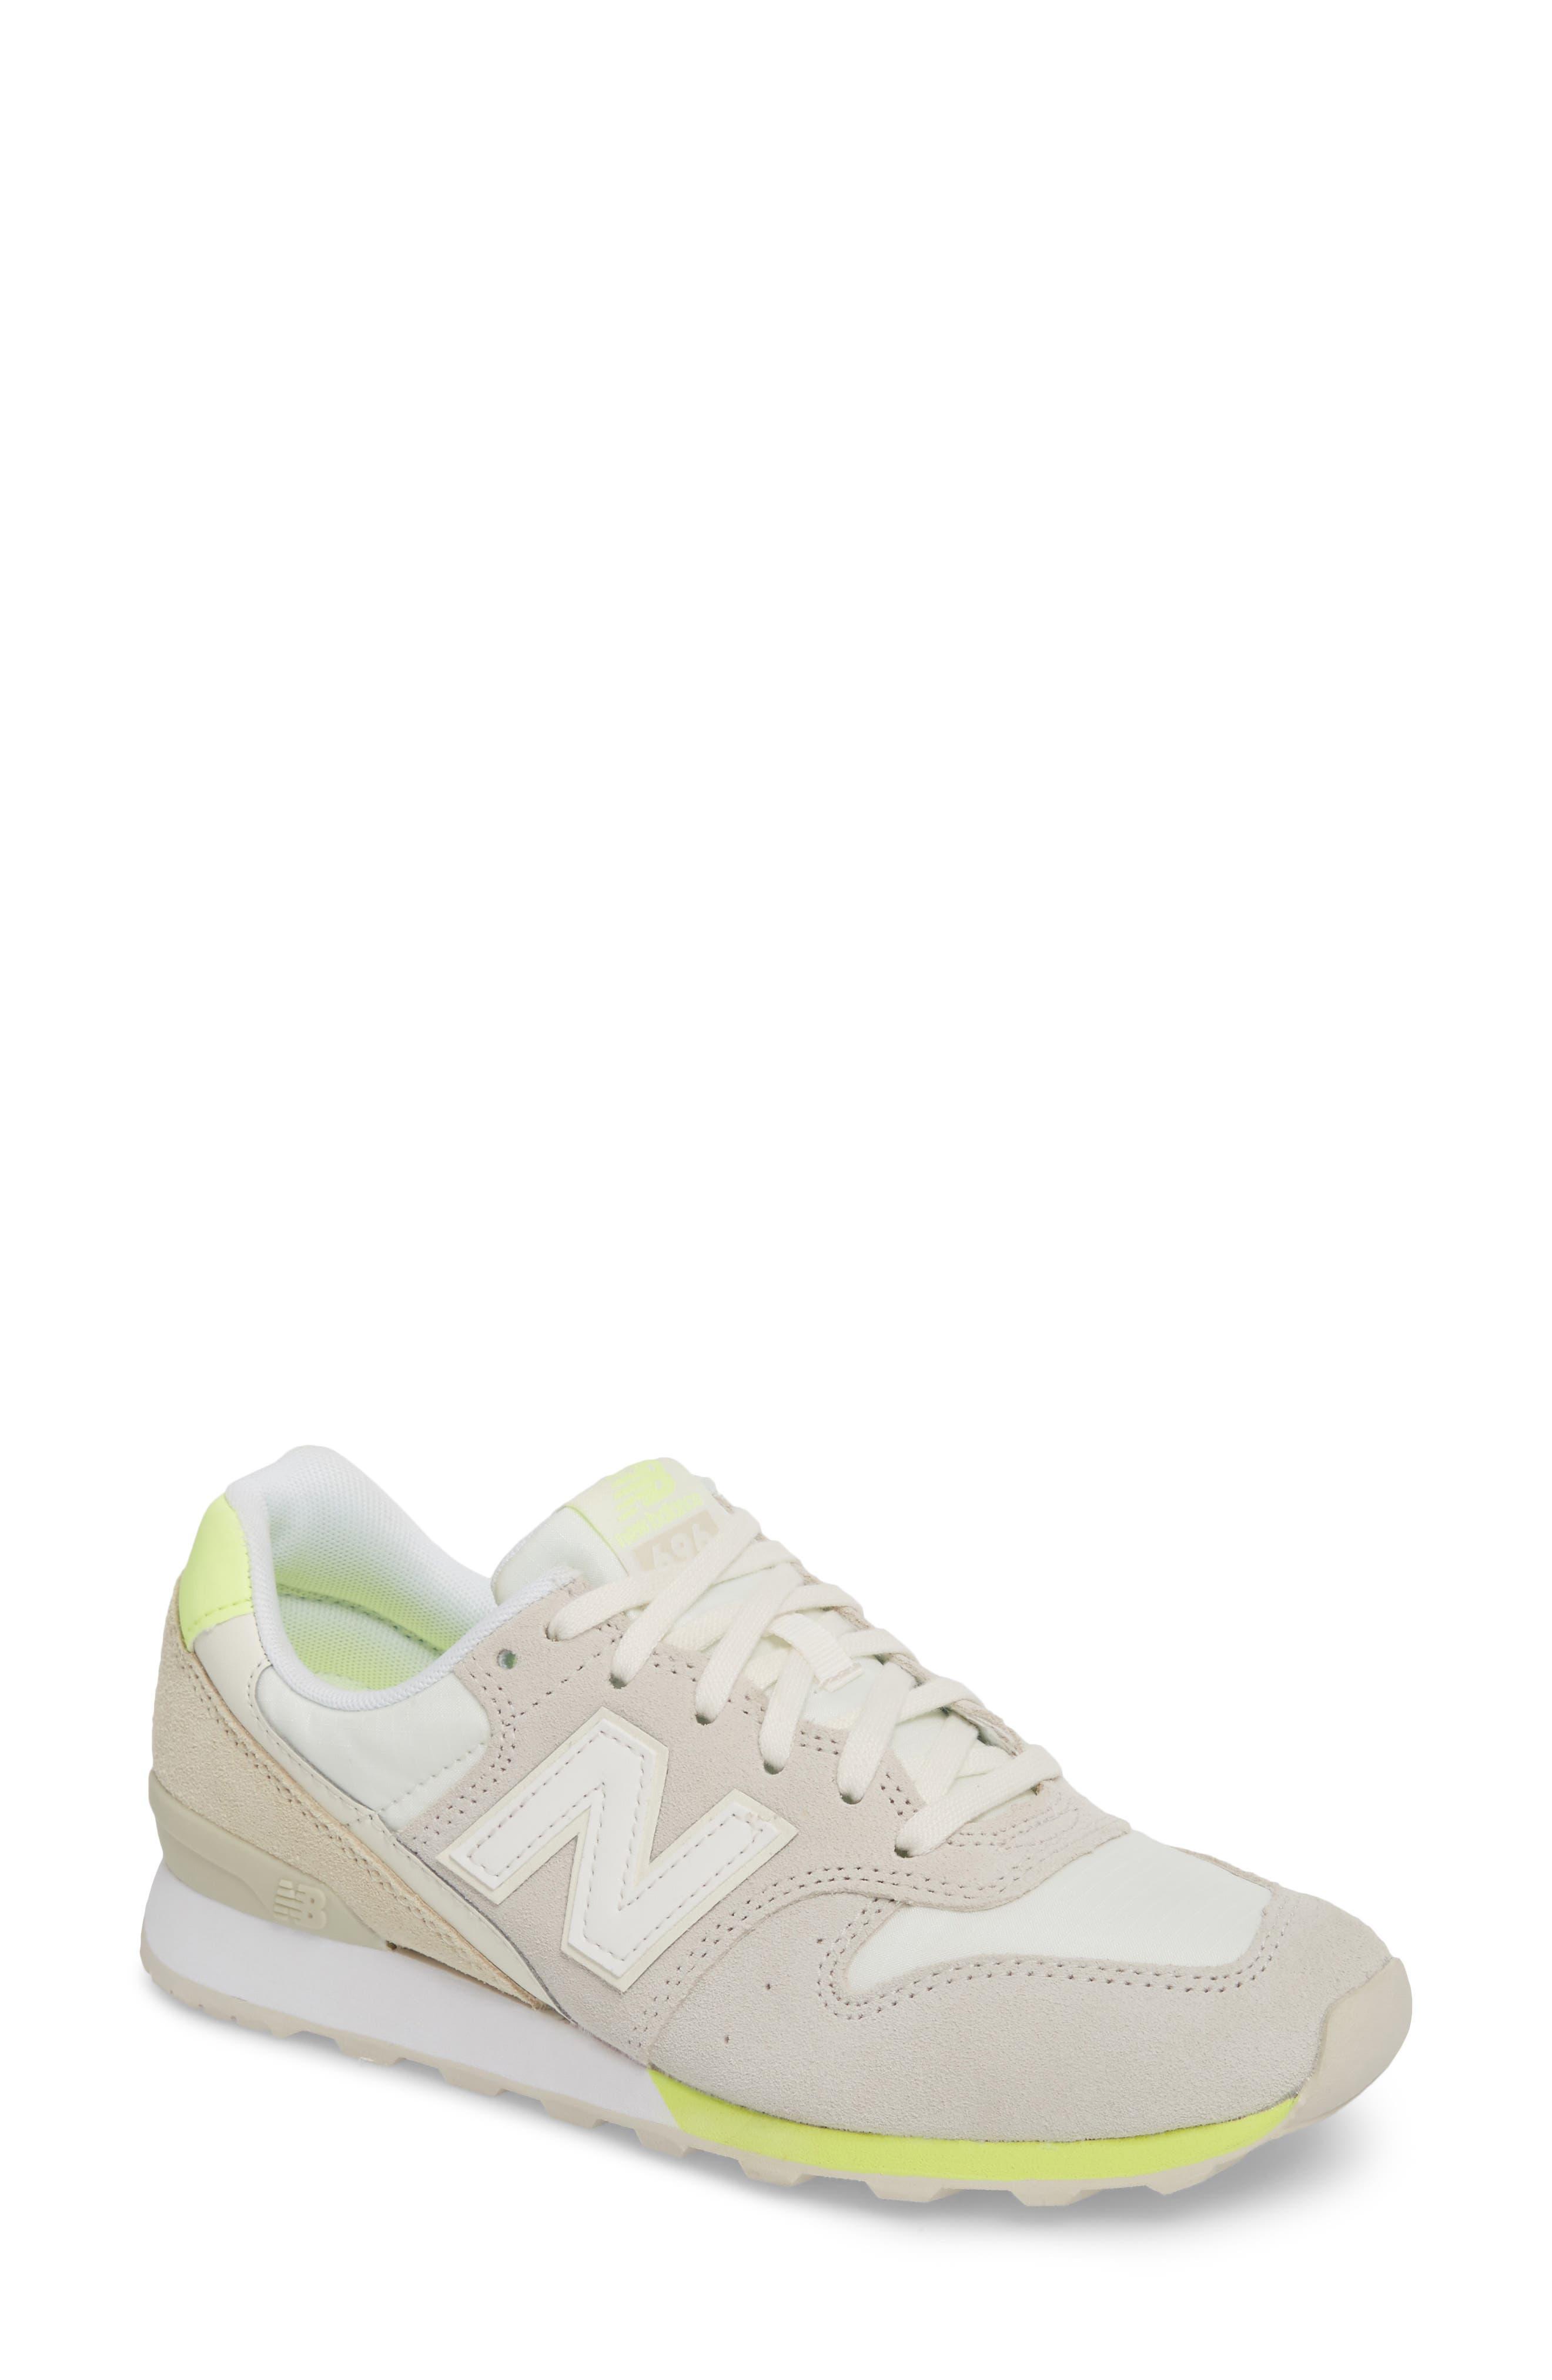 696 Suede Sneaker,                             Main thumbnail 1, color,                             250